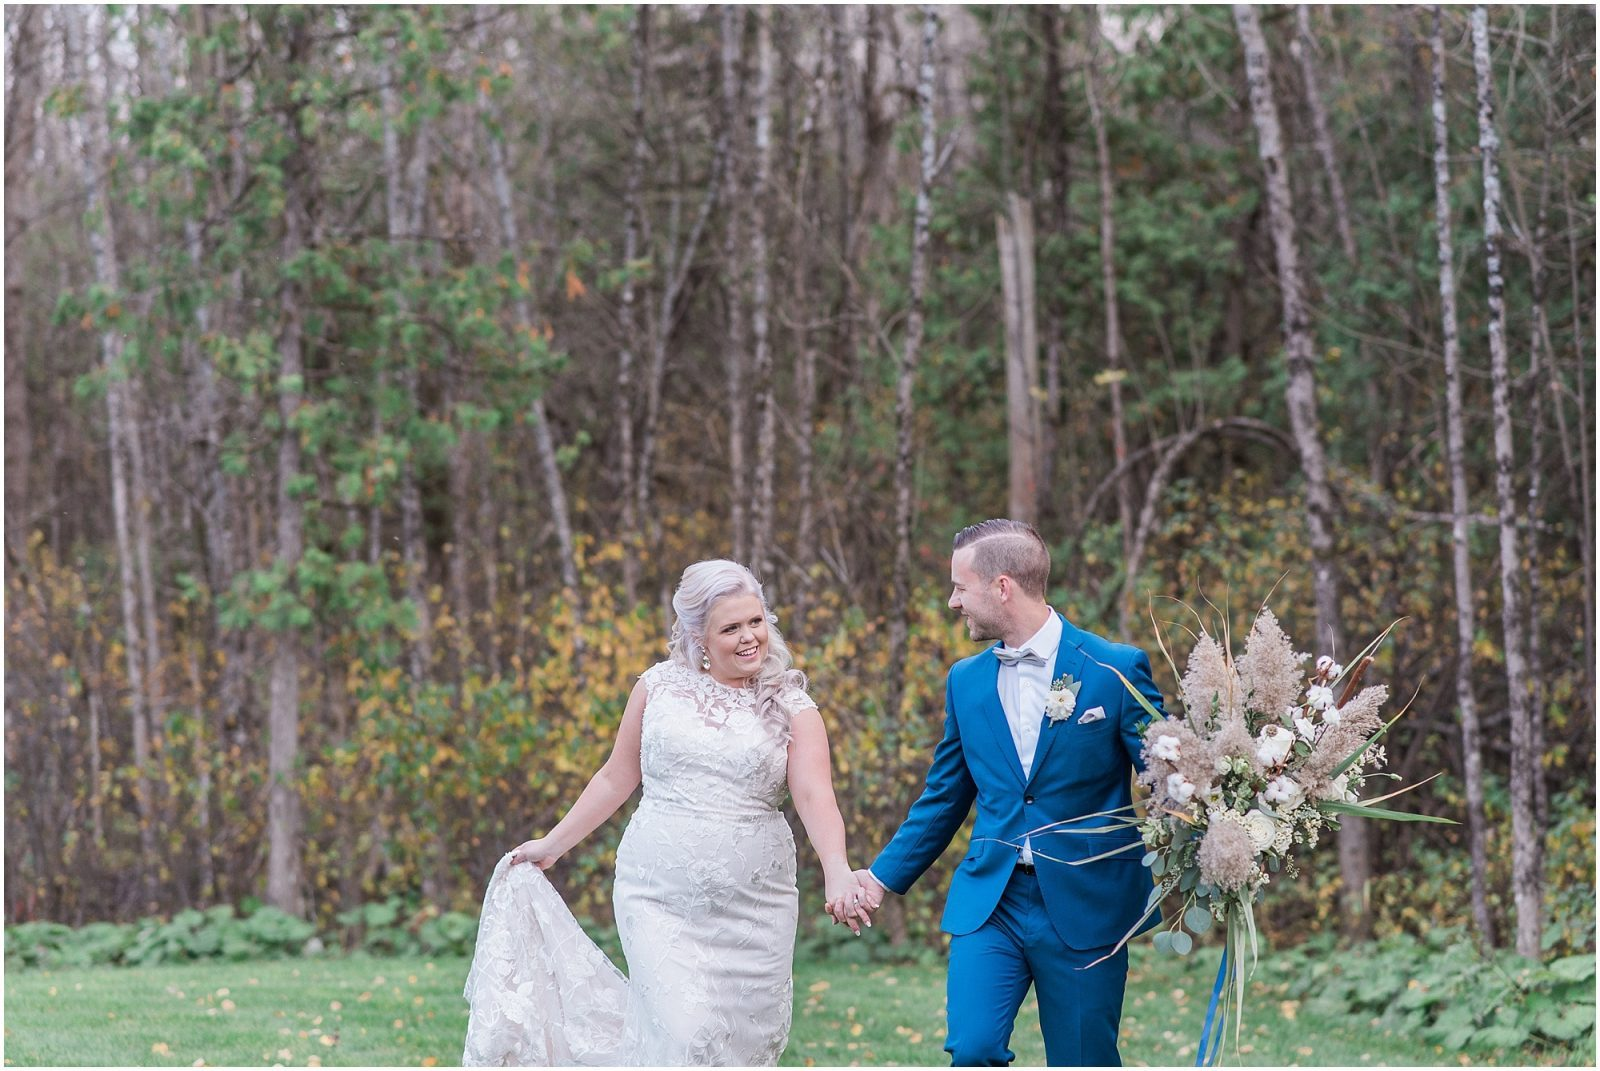 0054 Bethany and Luc - Fall Backyard Ottawa Wedding - Copper and Navy - PhotosbyEmmaH.jpg